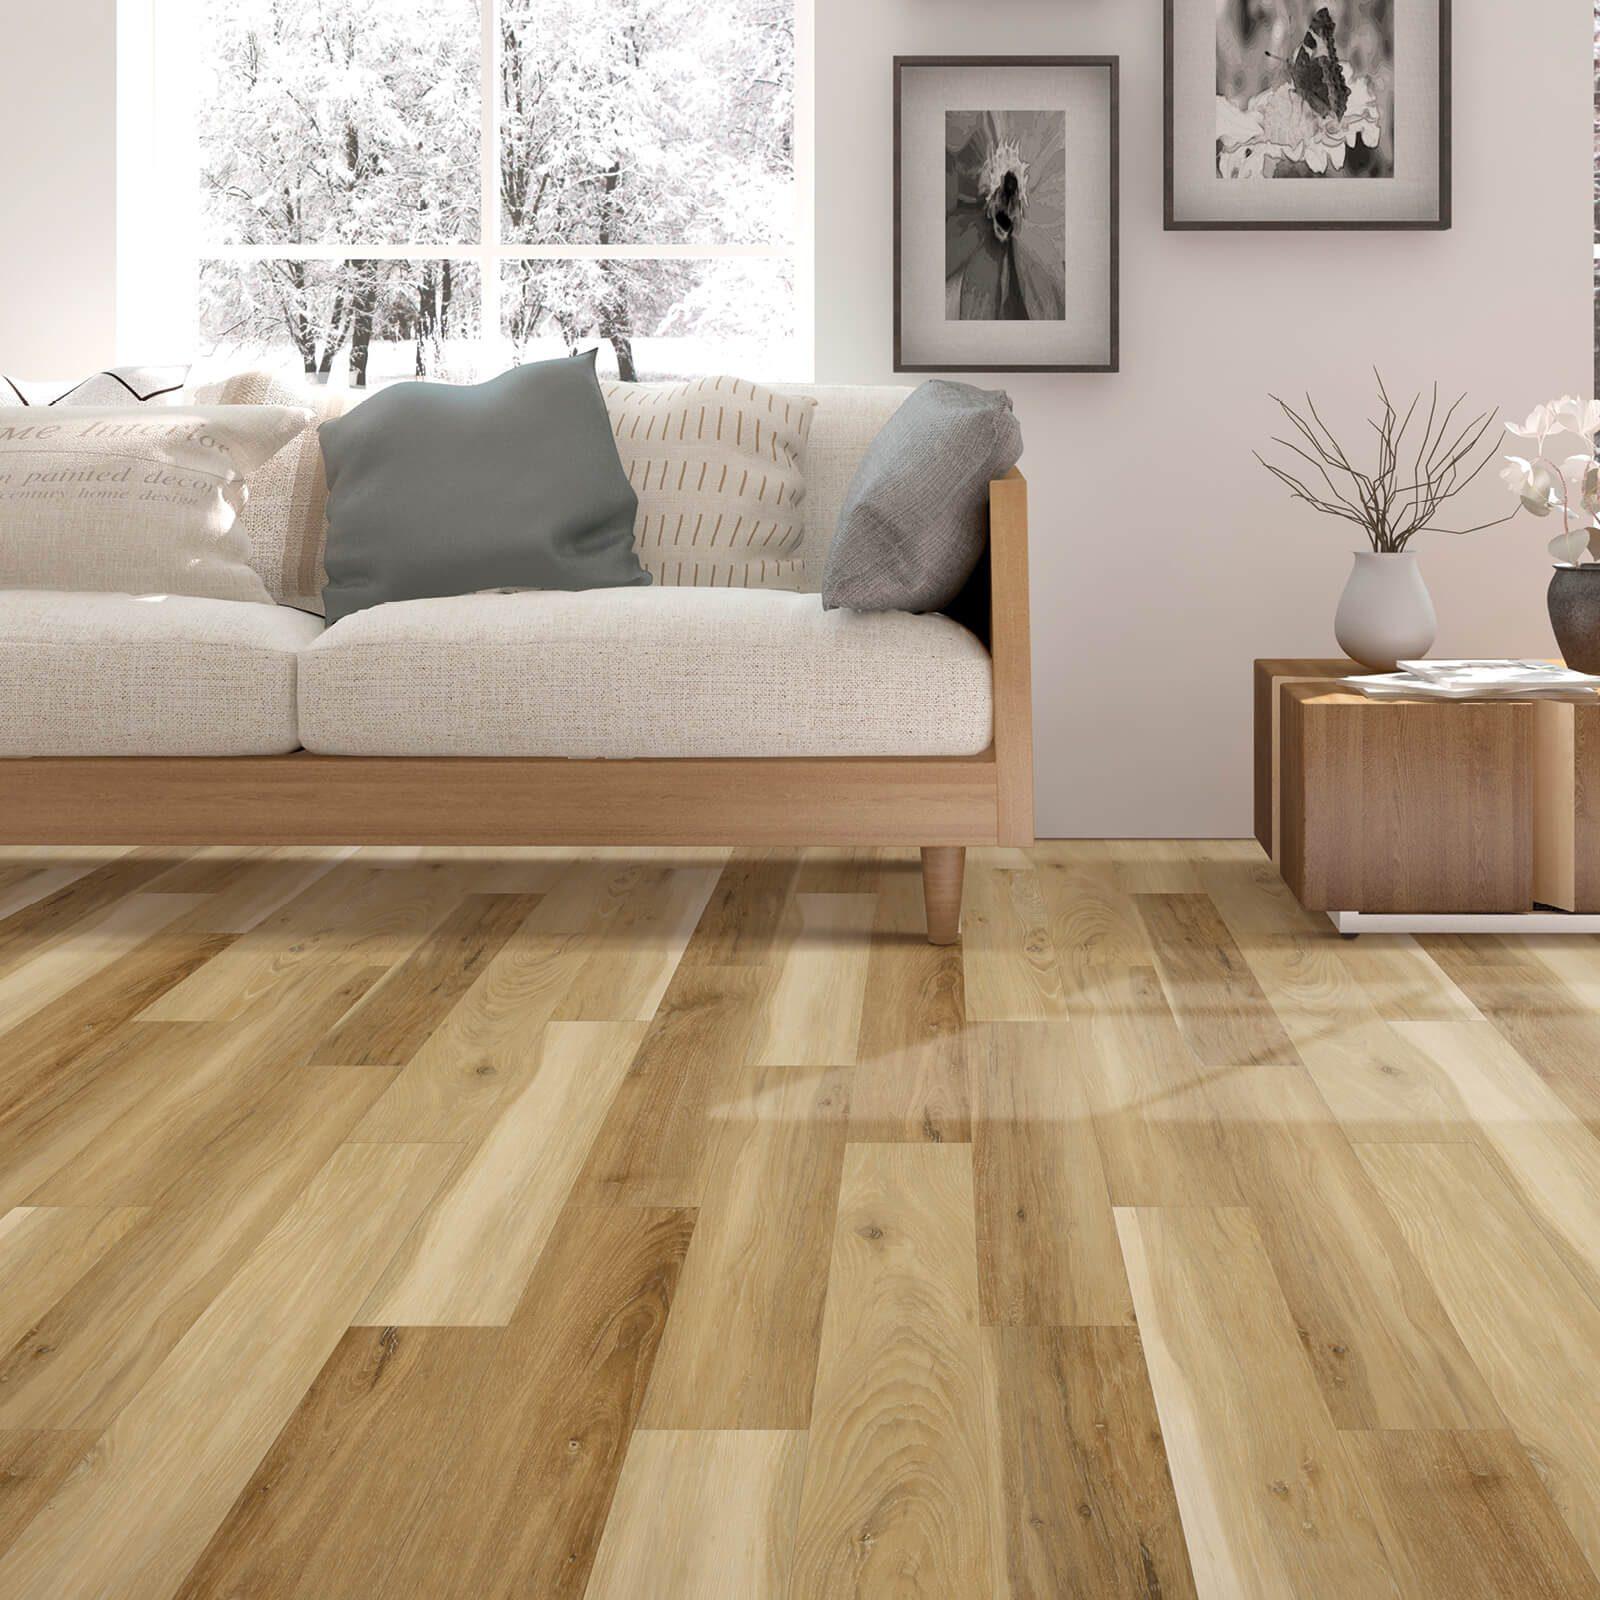 Mohawk laminate flooring | Westport Flooring